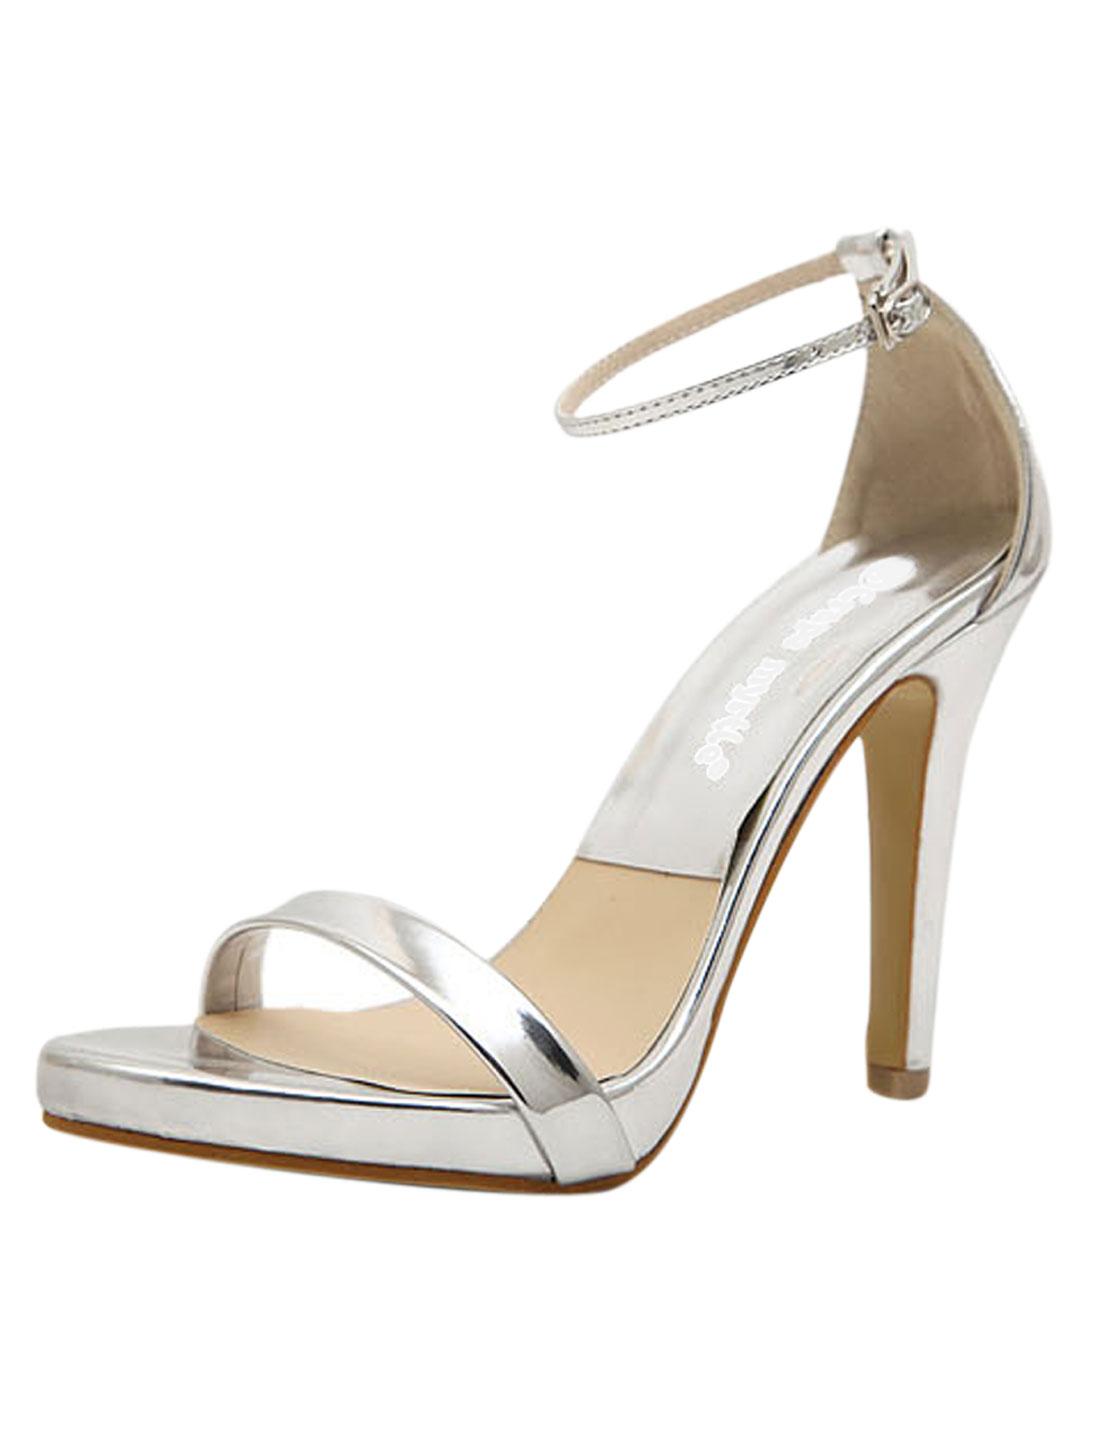 Women Open Toe Metallic Strappy High Heel Sandals Siver Tone US 7.5